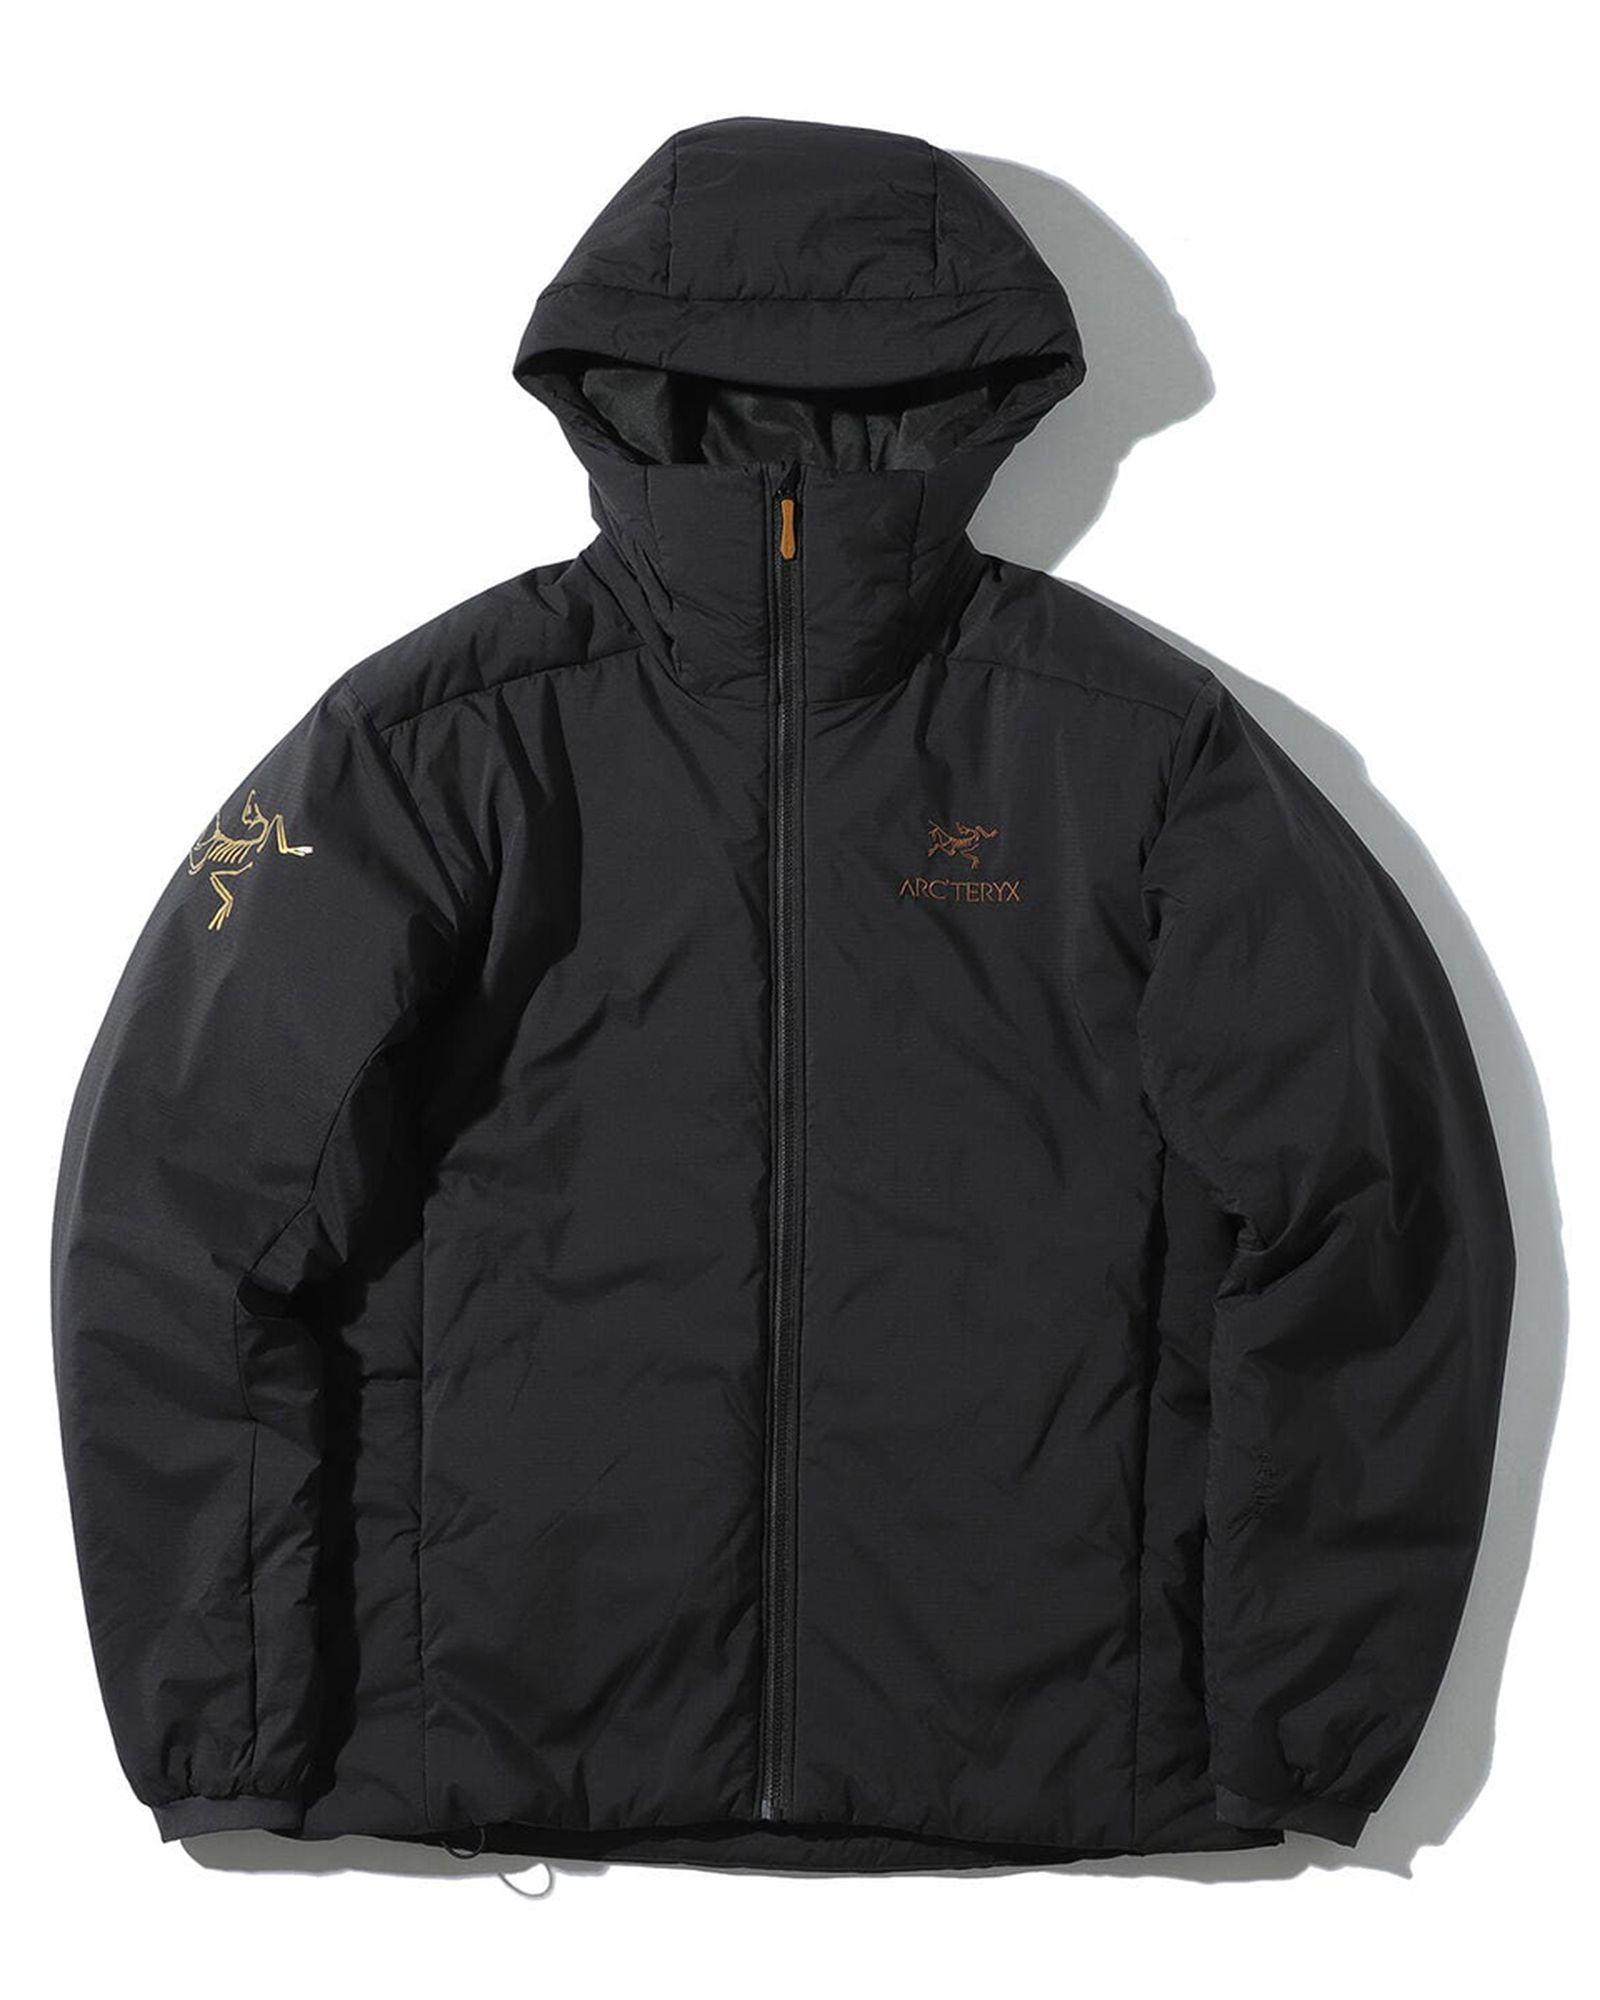 beams arcteryx fall winter 2021 fw21 black gold zeta sl atom ar hoody jacket mantis 1 2 bag collaboration collection